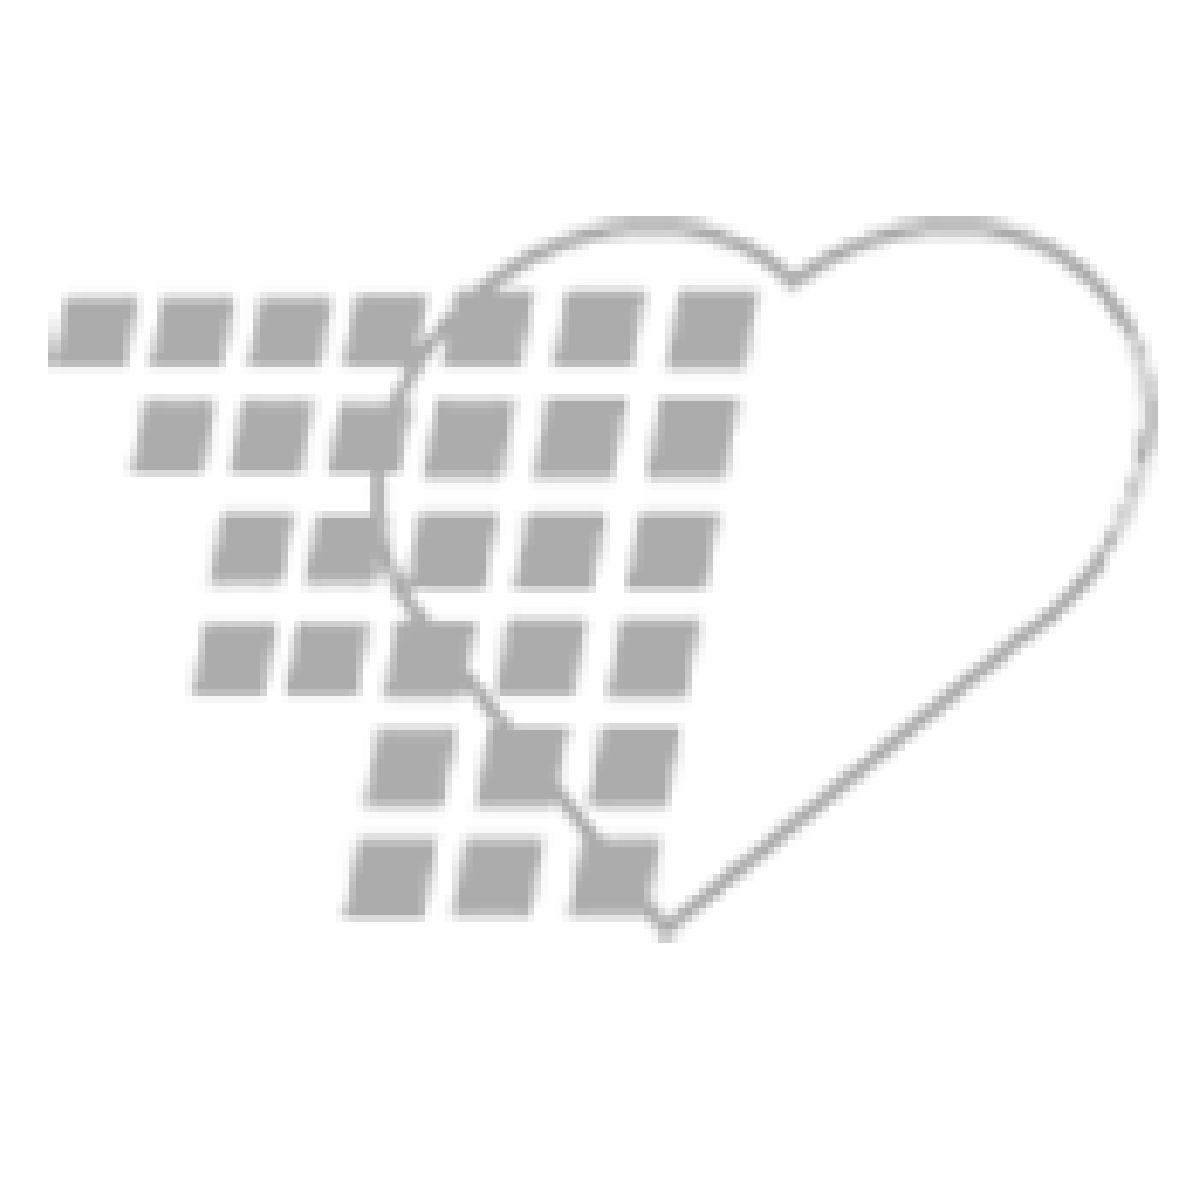 06-93-0070 - Demo Dose® Ciprofloxacn (Cipr) 500 mg - 100 Pills/Bottle